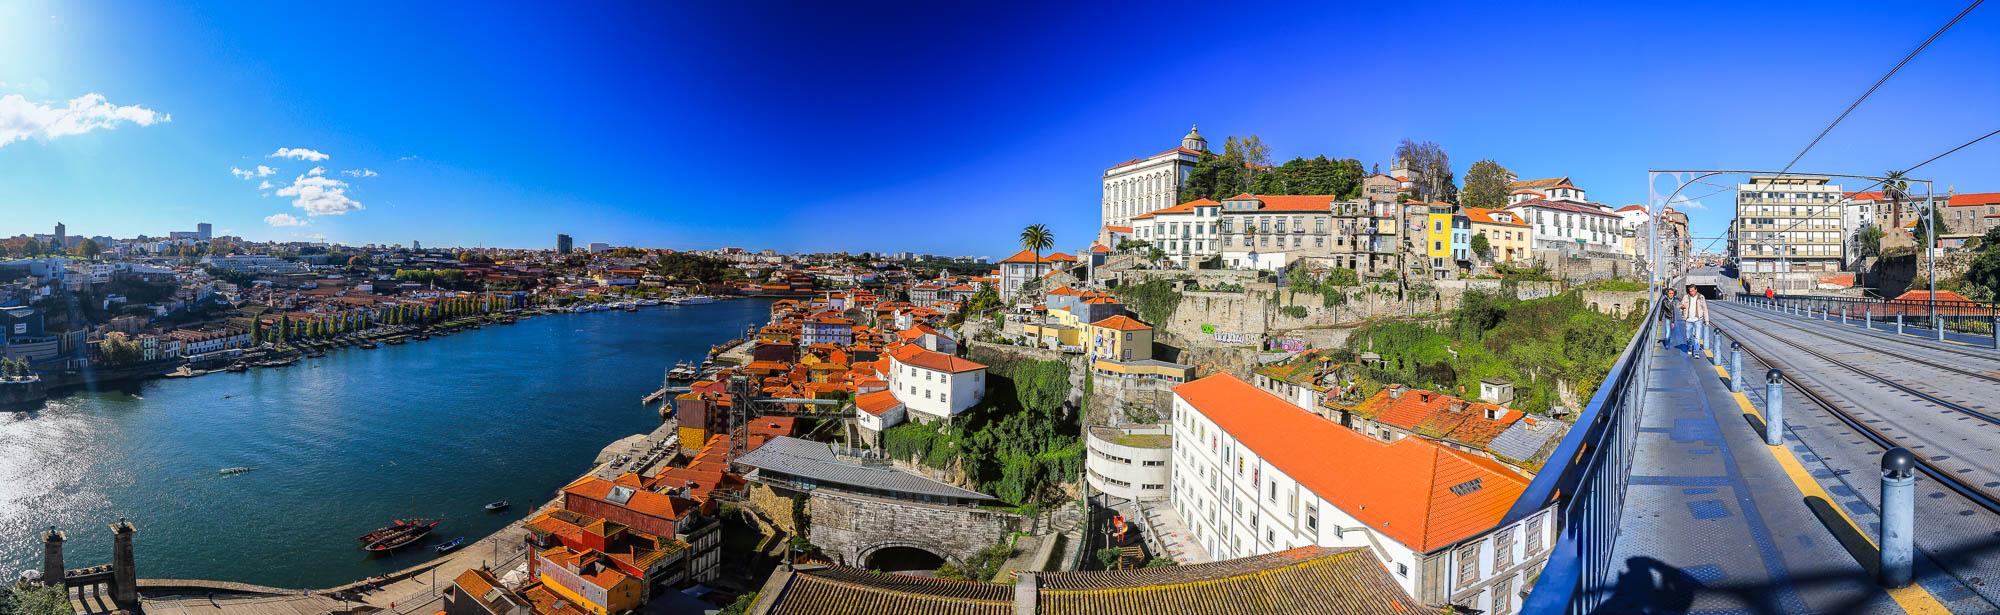 PORTUGAL-2012-jusmedic-#970-Pano